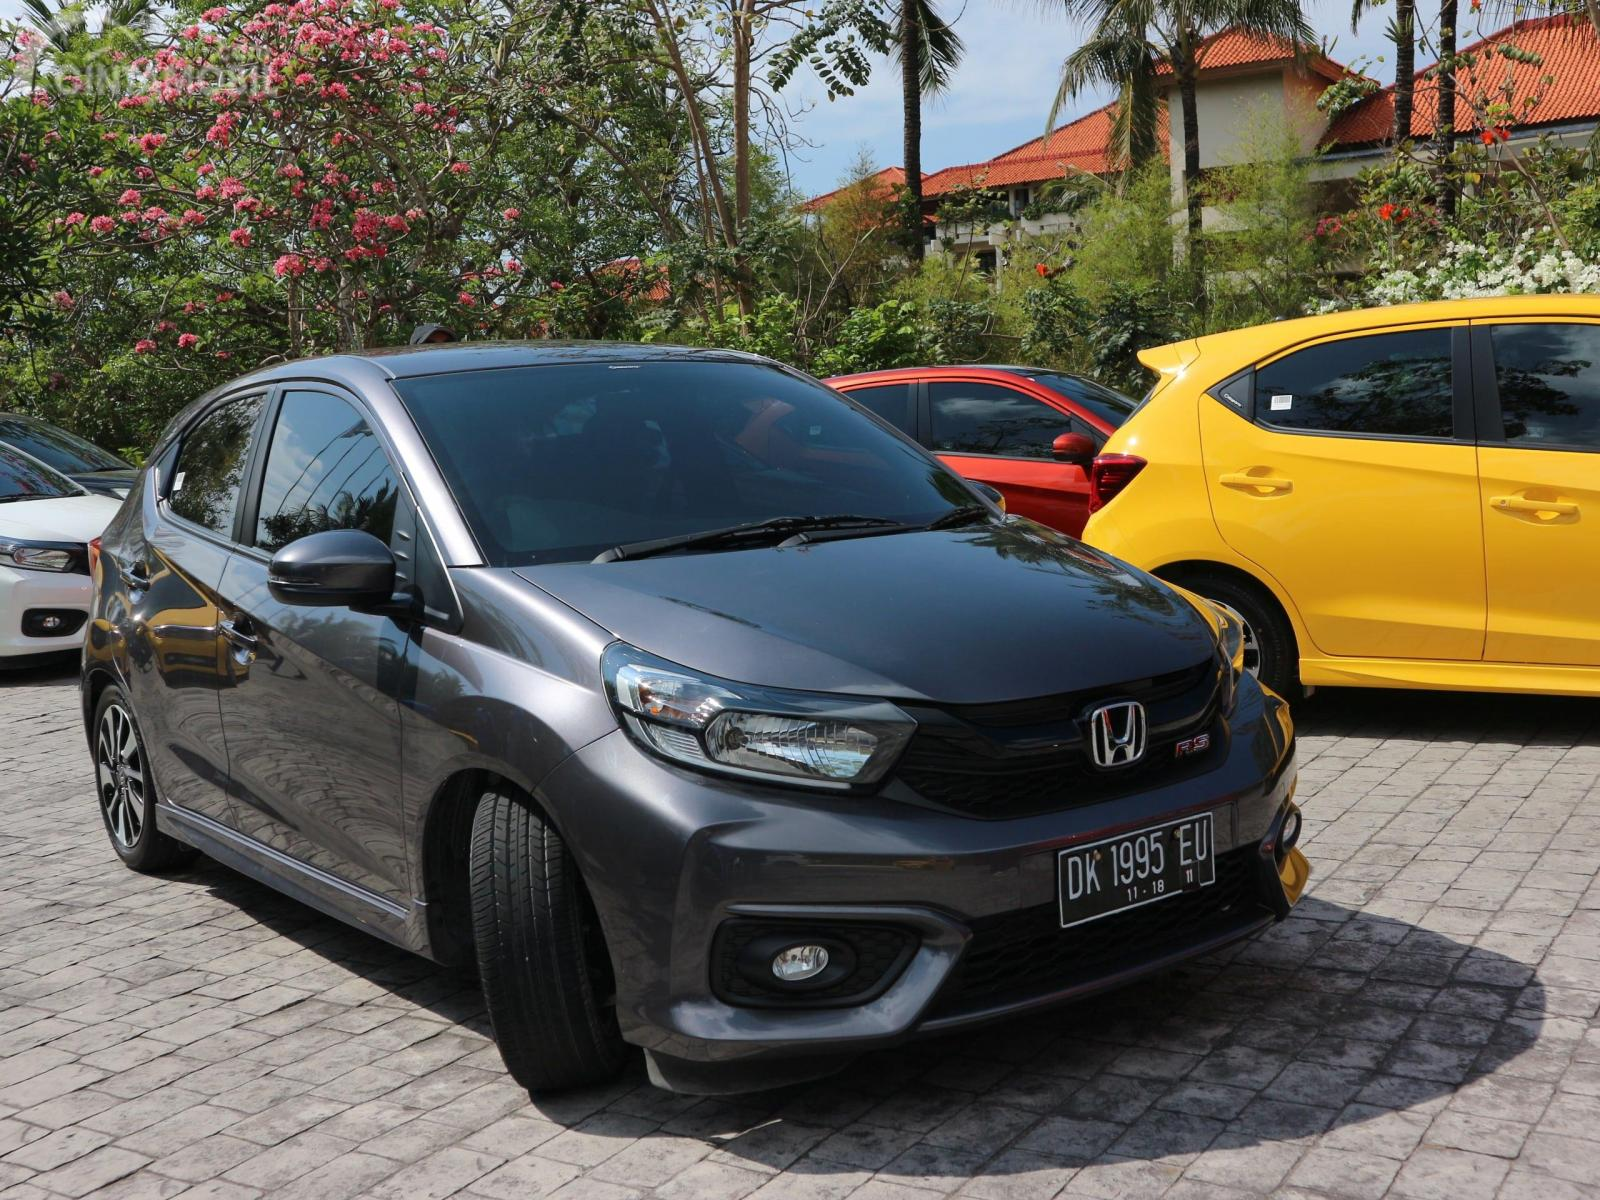 Kelebihan Harga Brio Rs 2018 Spesifikasi